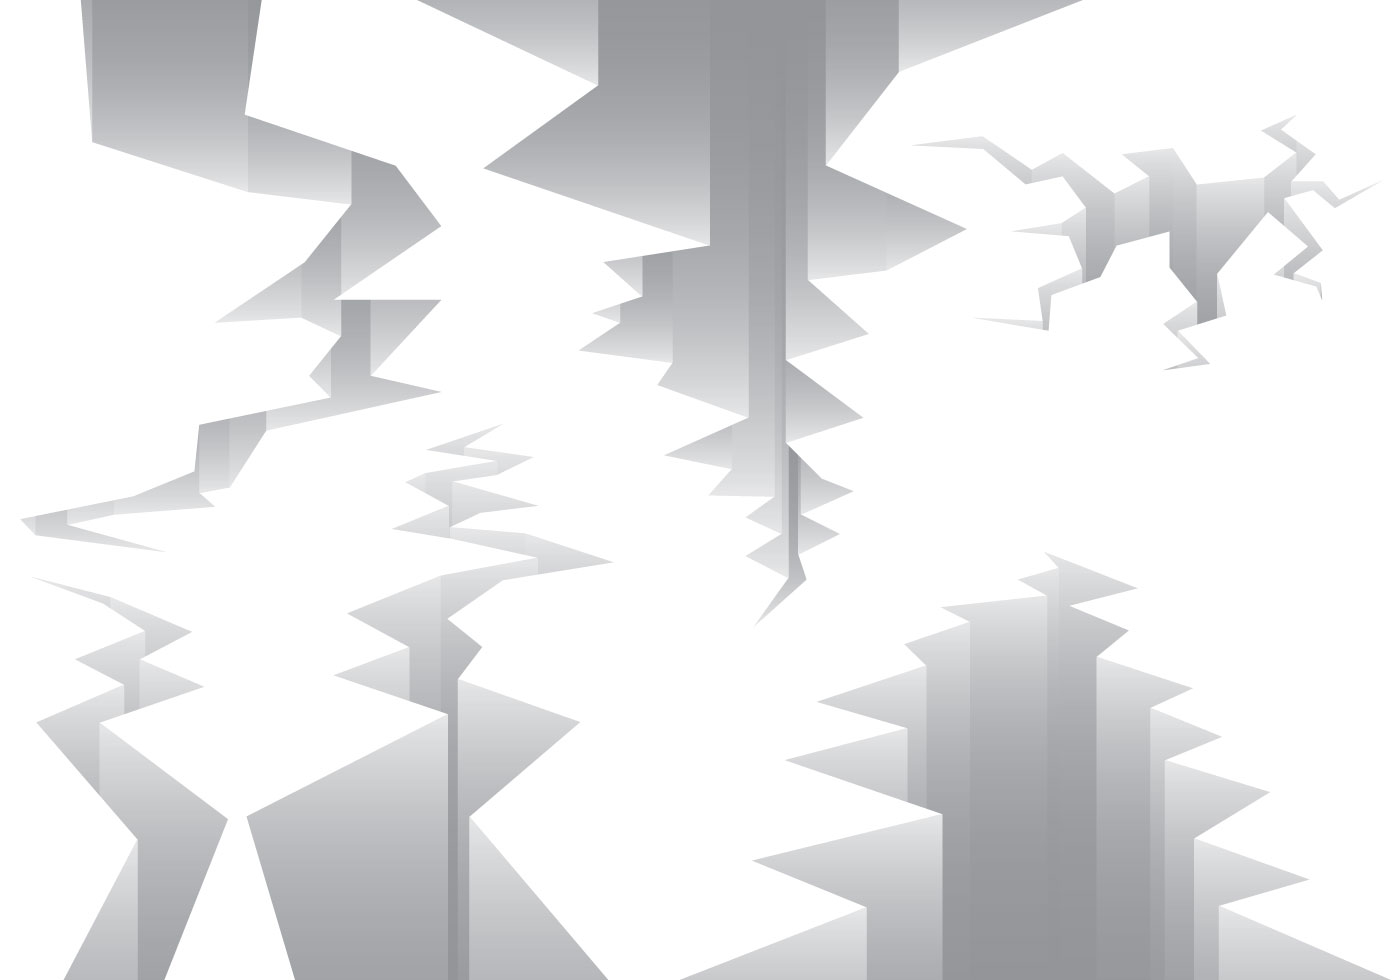 paper fault error intermec 22082018 intermec-pm4i-barcode-printer-manual  shut cutter open & shut cutter paper fault cutter error 1  your local intermec this error.